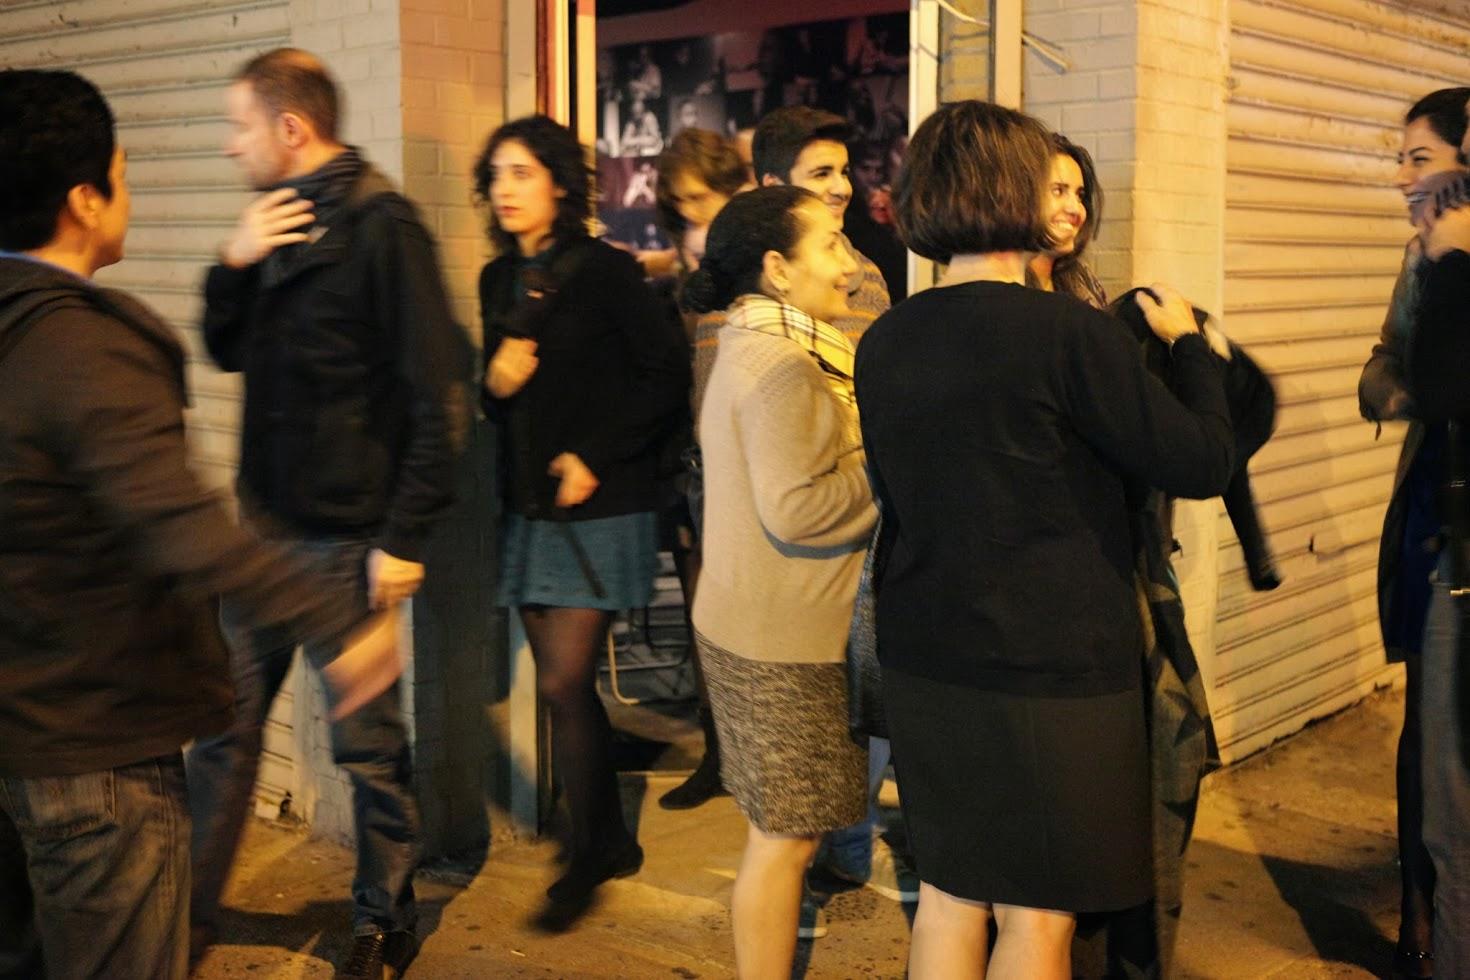 Patrice_Helmar_Stone Sidewalk Action-4.JPG